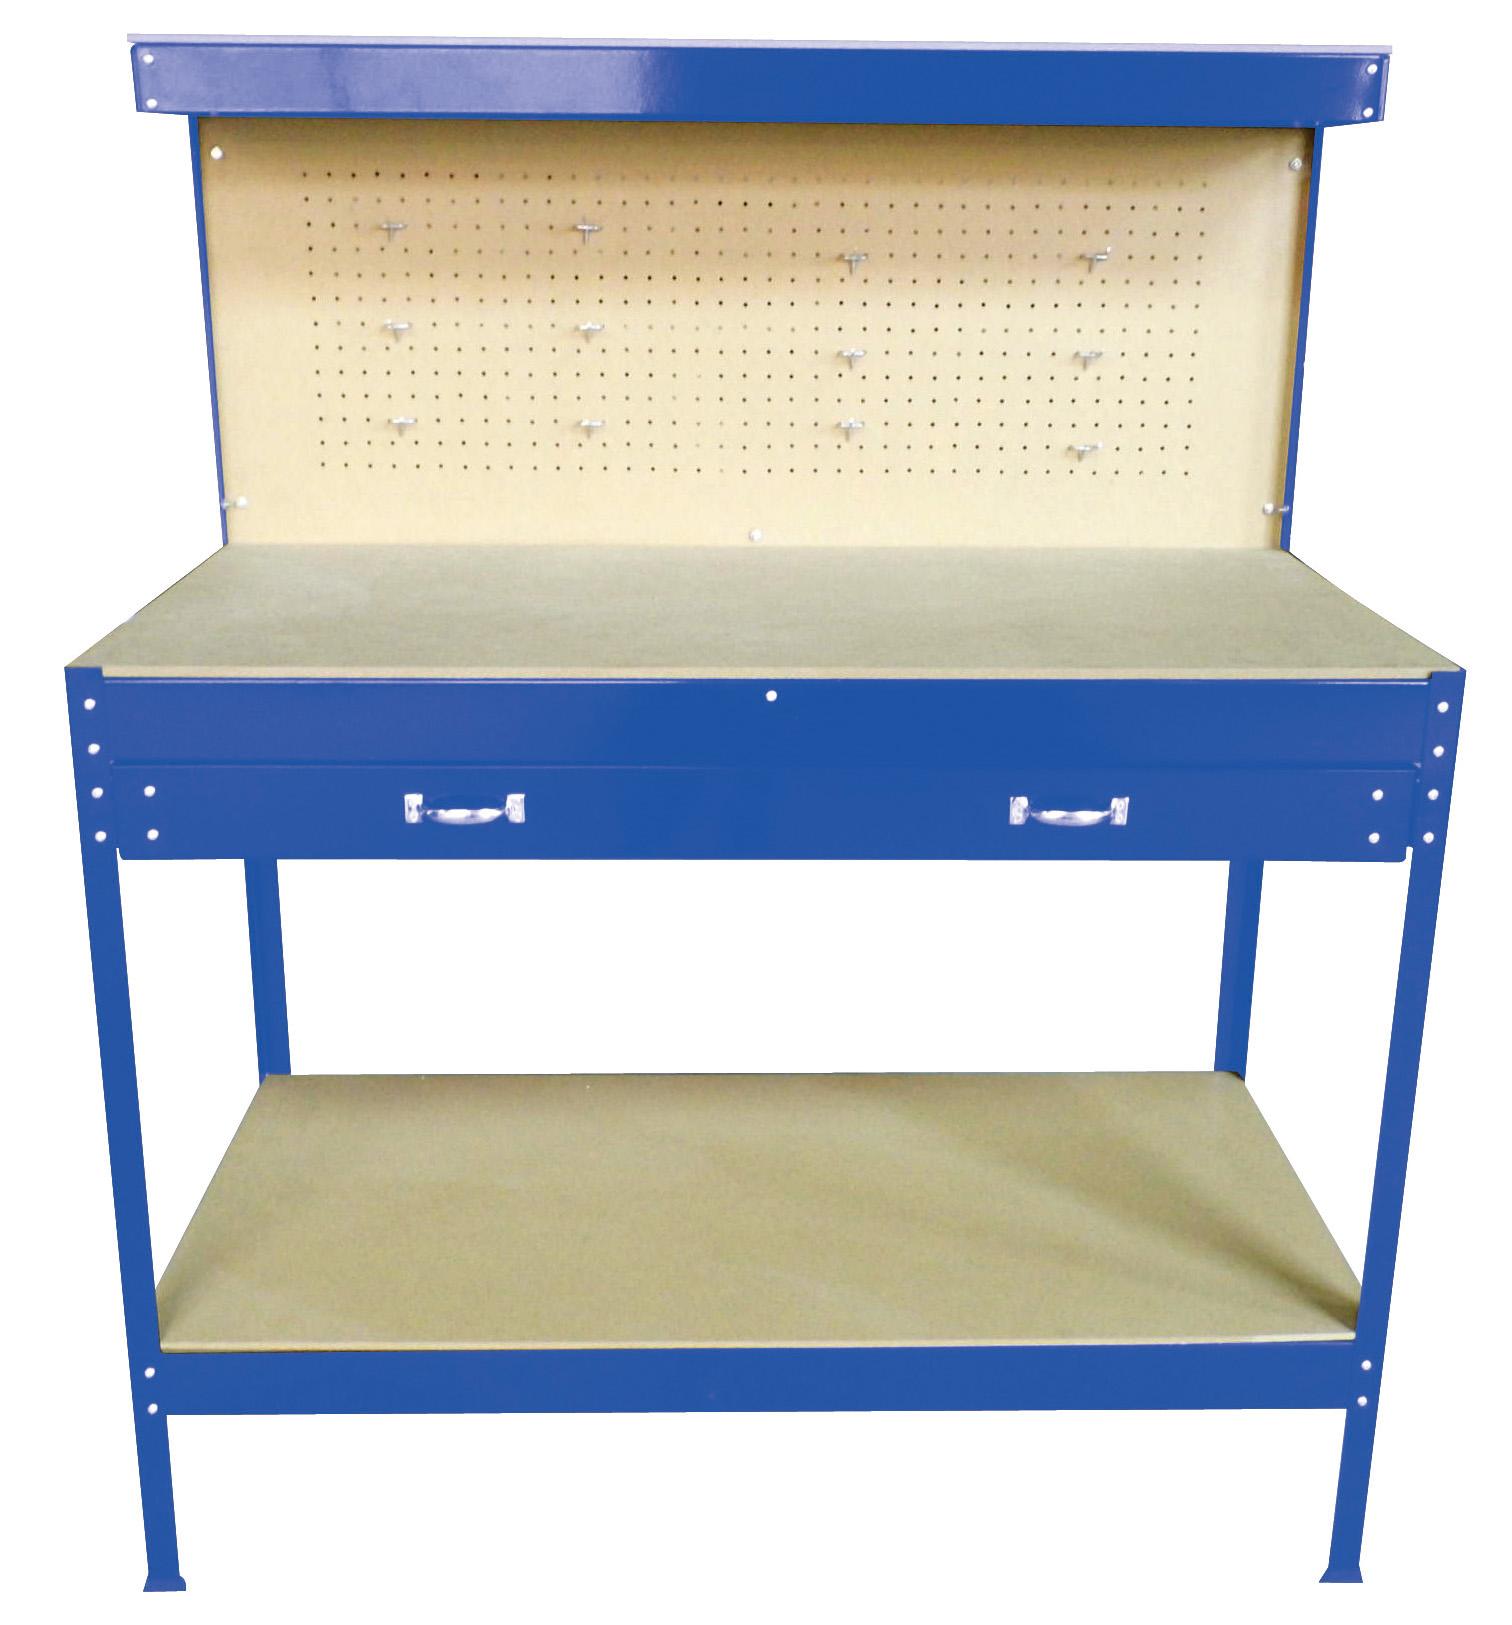 New Blue Steel Tools Box Workbench Garage Workshop Table